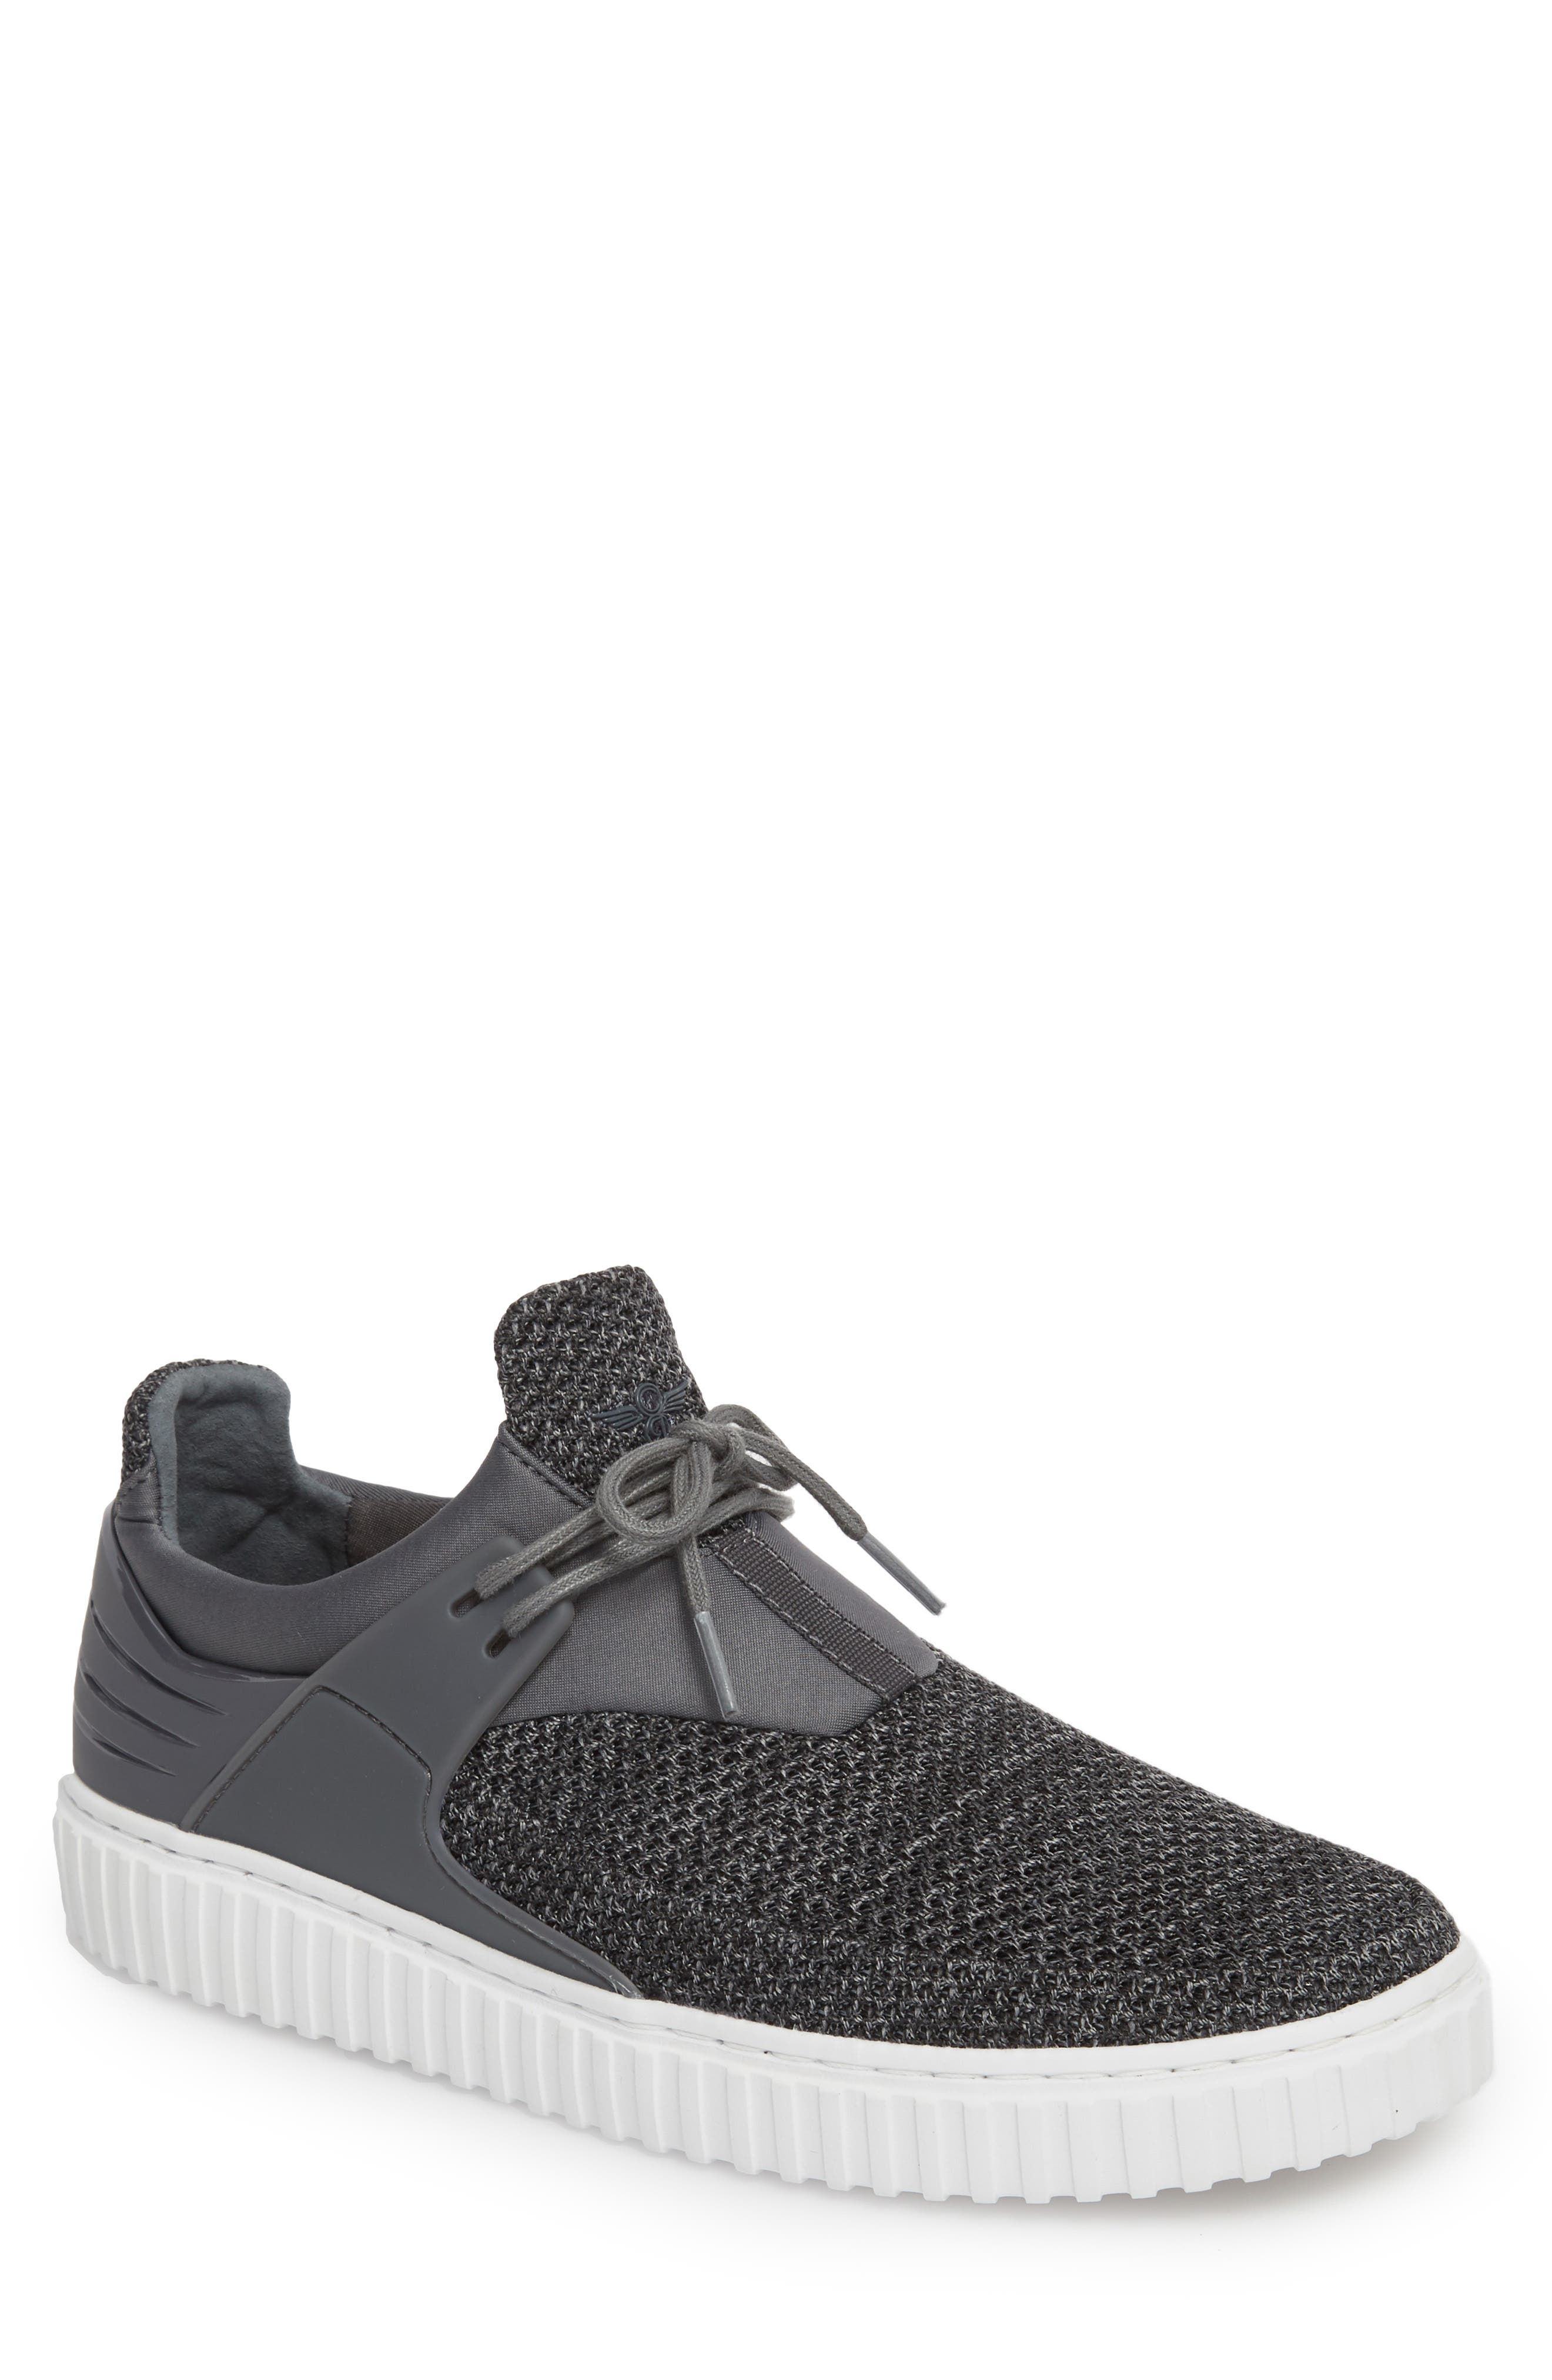 Castucci Knit Sneaker,                             Main thumbnail 1, color,                             021